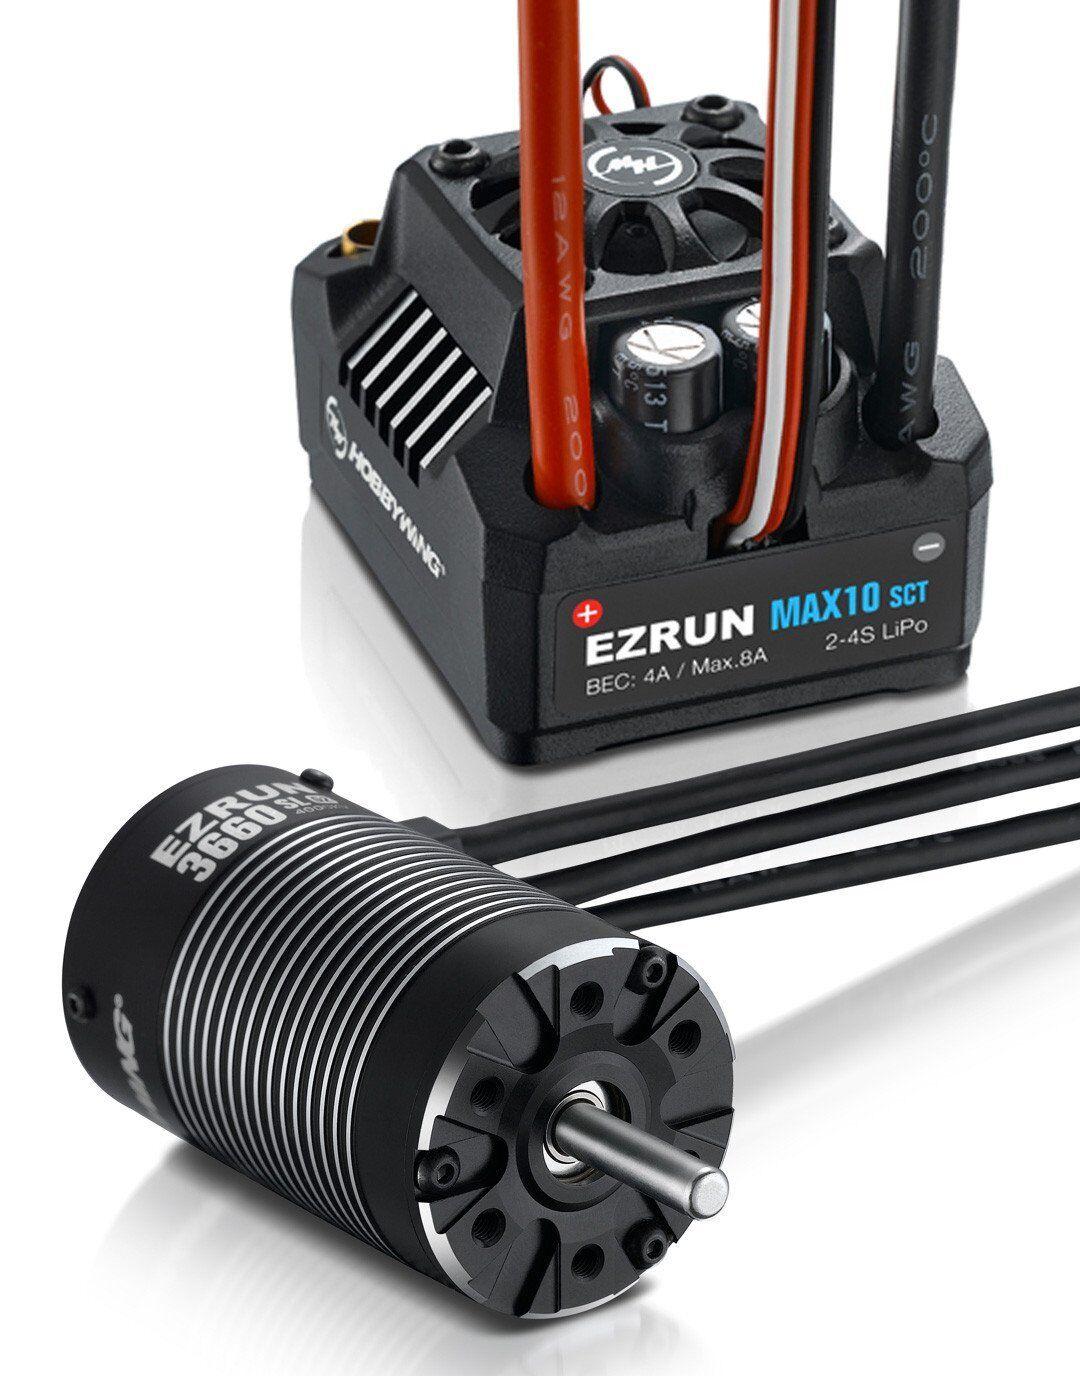 Hobbywing EZRUN MAX10-SCT 120 A ESC +3660 SL G2 MOTORE BRUSHLESS 4000 kV 1/10 auto